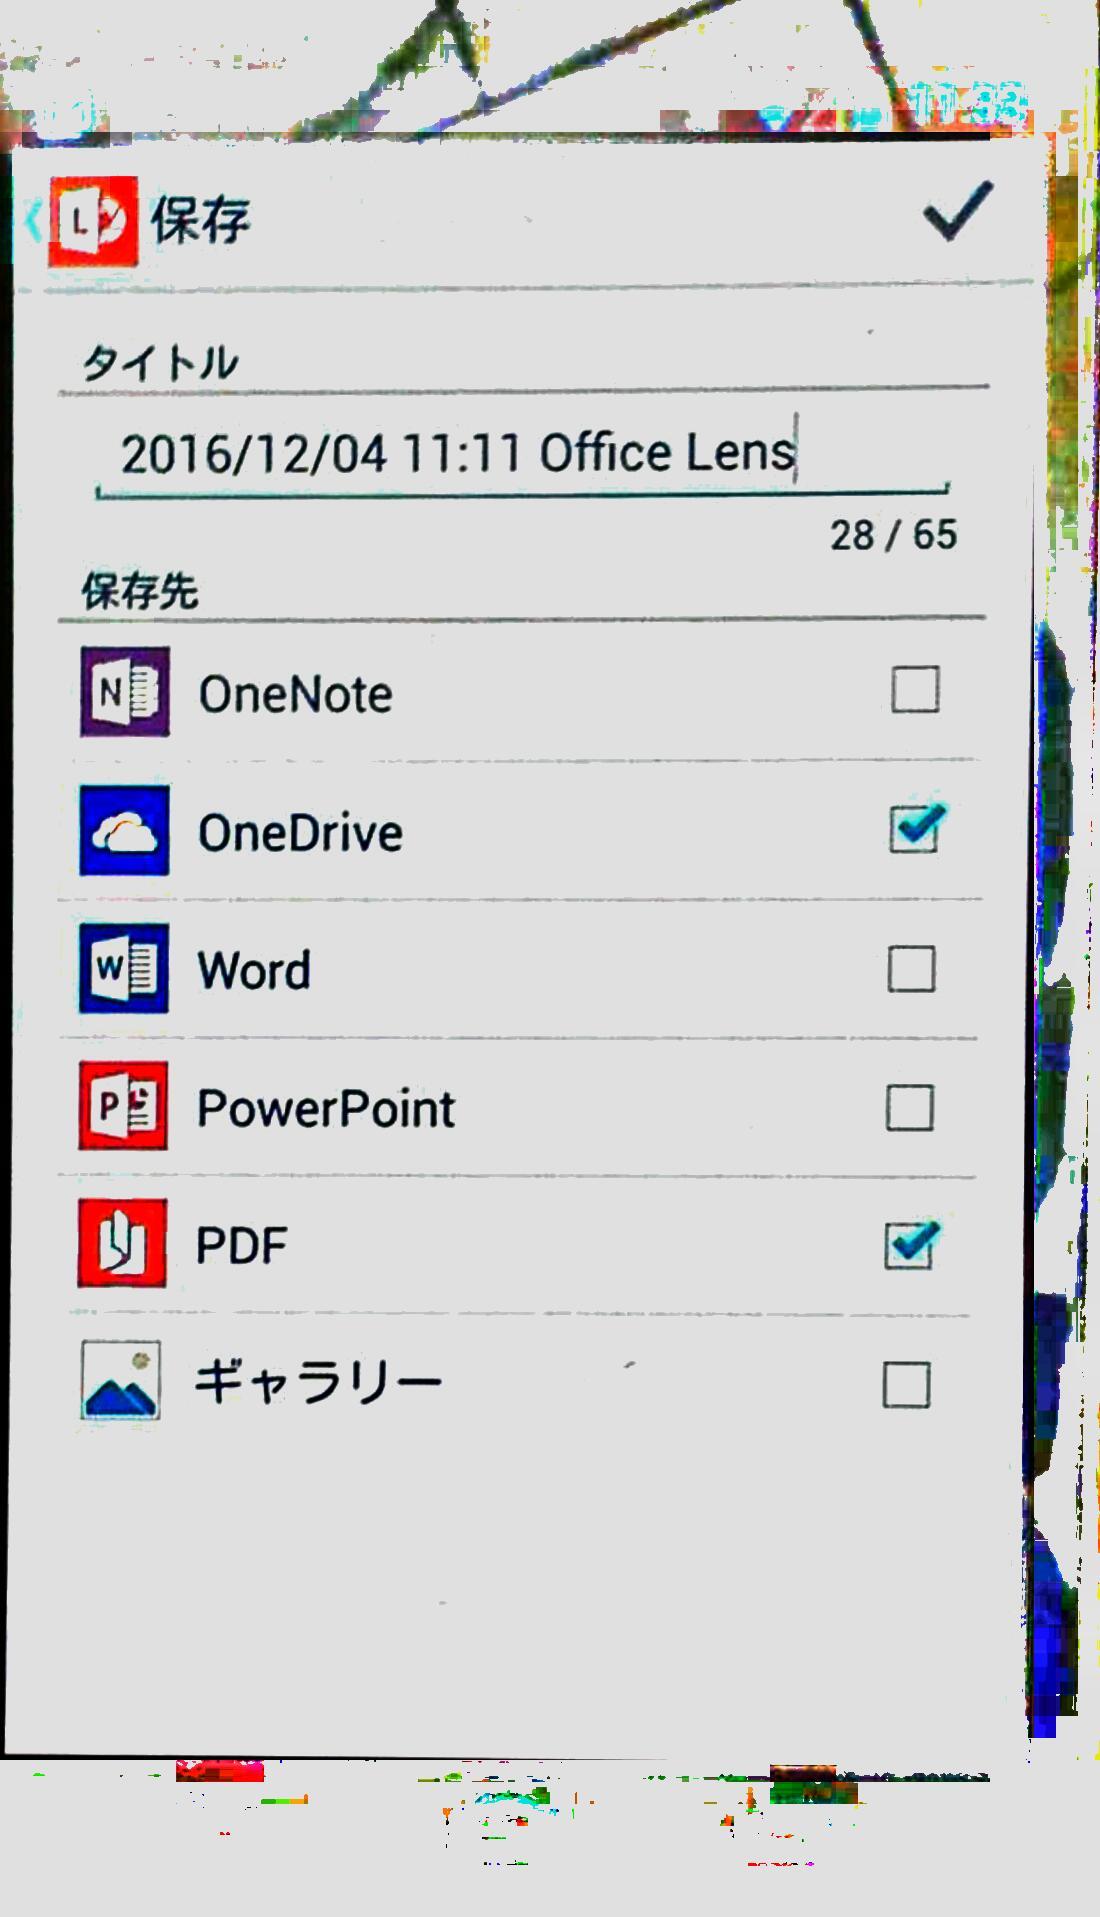 office lens 超スグレモノのツールだが